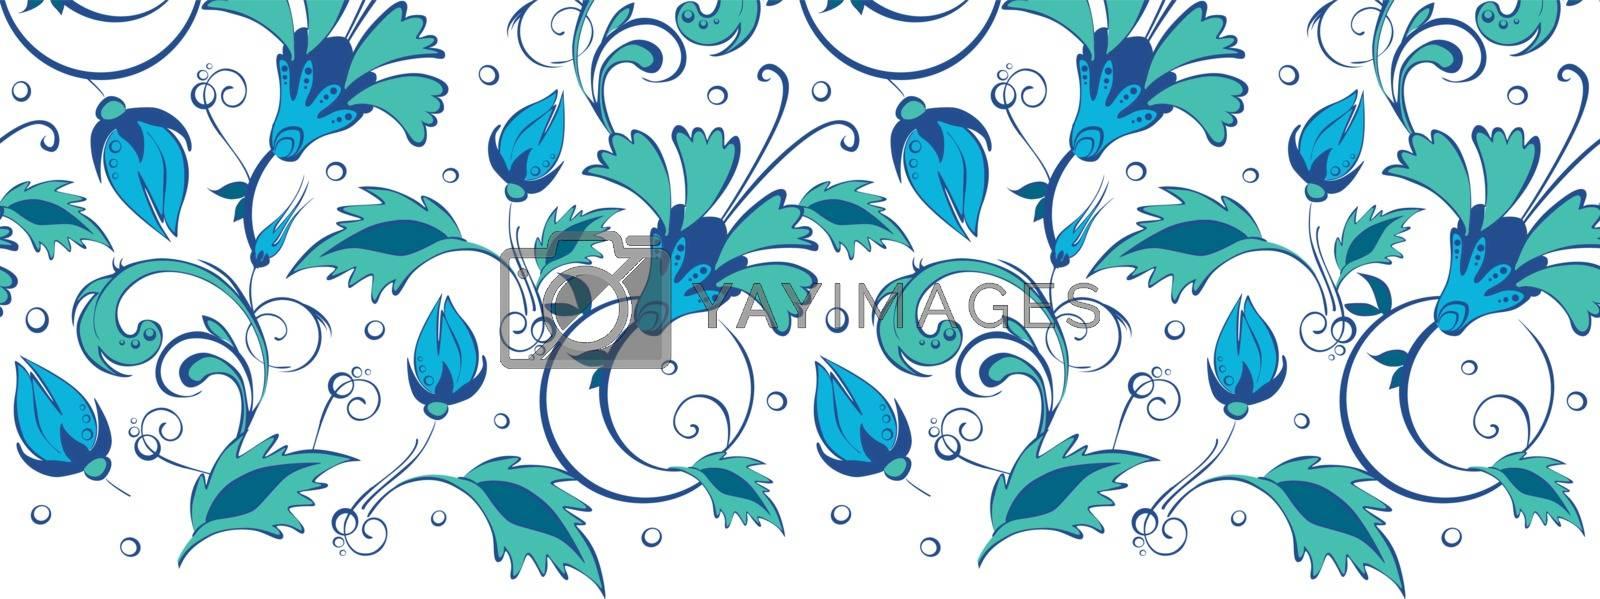 Vector blue green swirly flowers horizontal border seamless pattern background graphic design